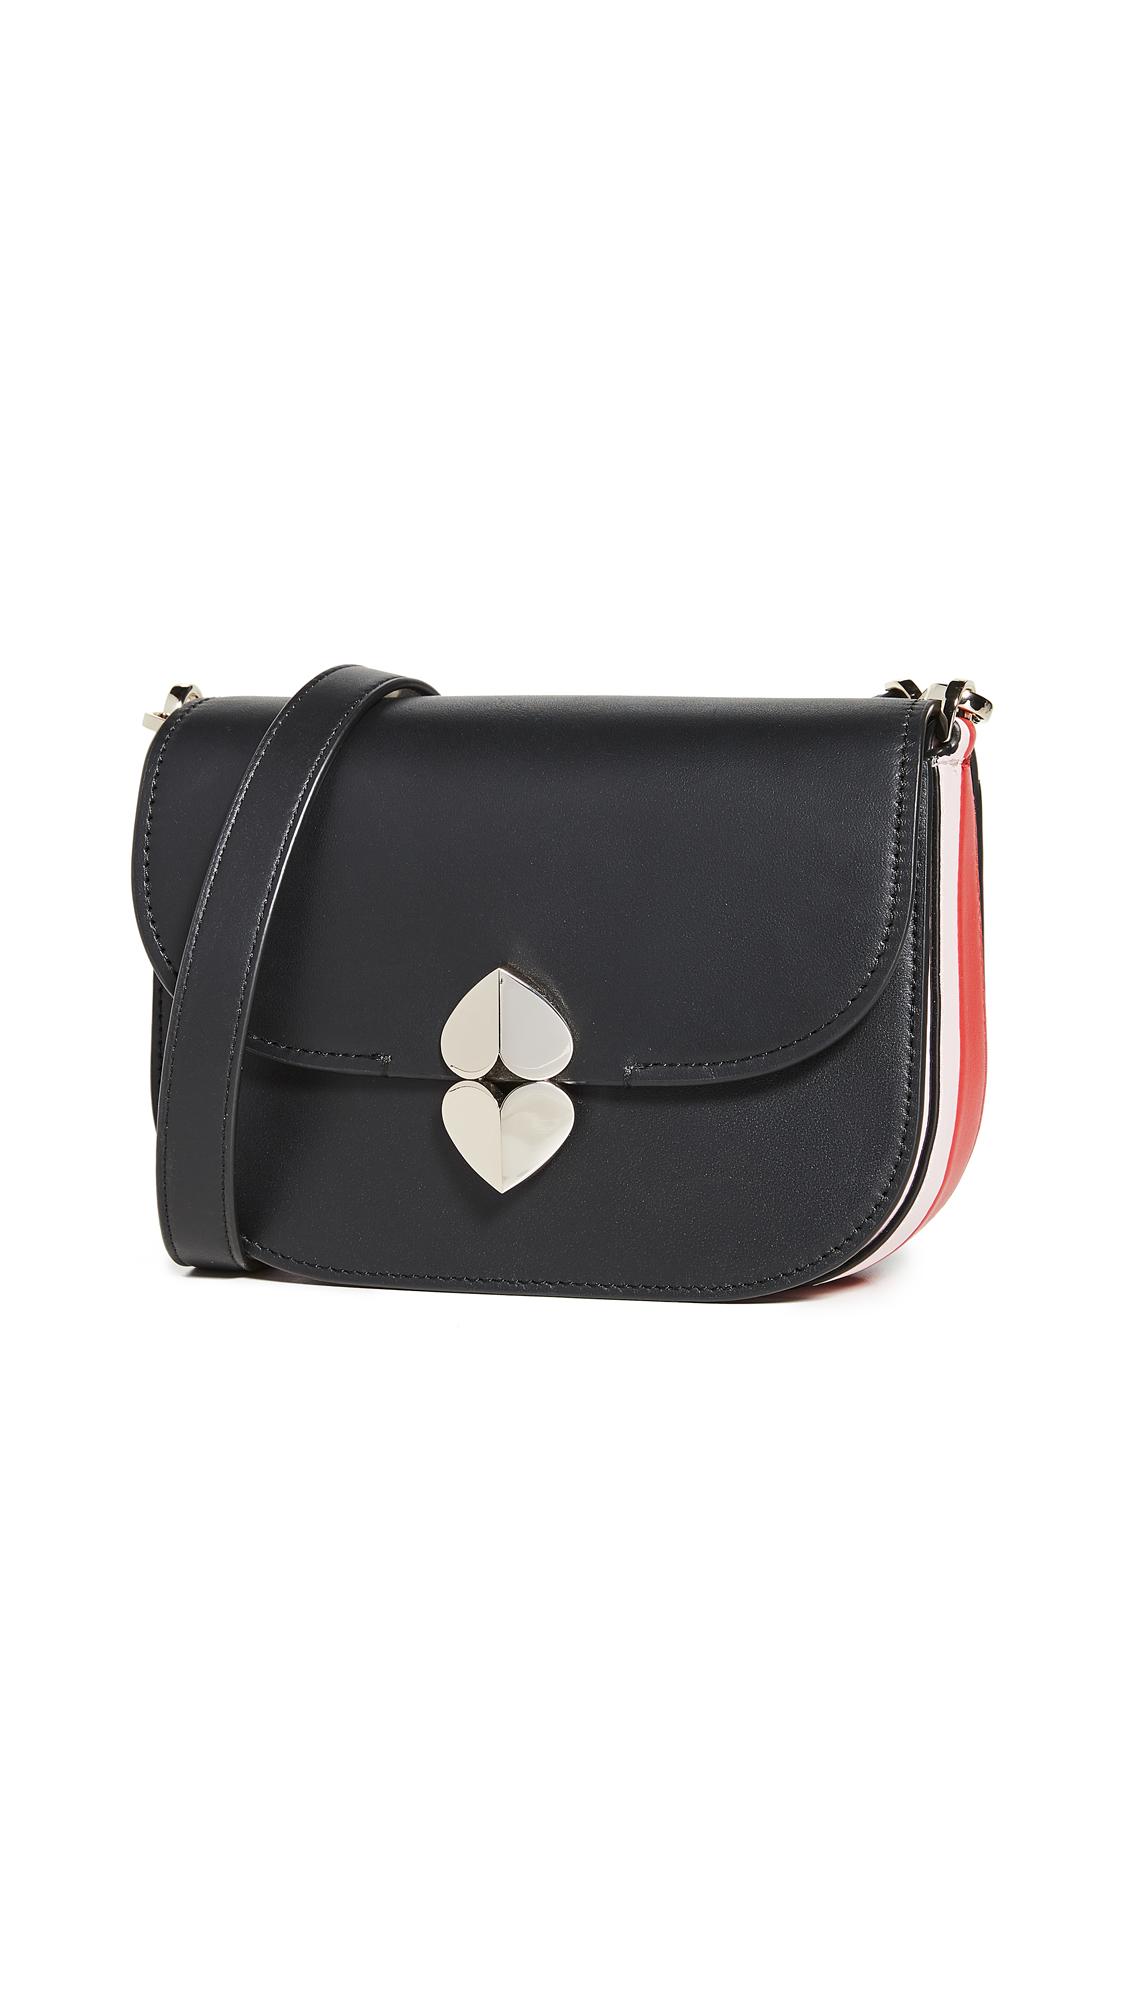 Buy Kate Spade New York online - photo of Kate Spade New York Lula Small Saddle Bag